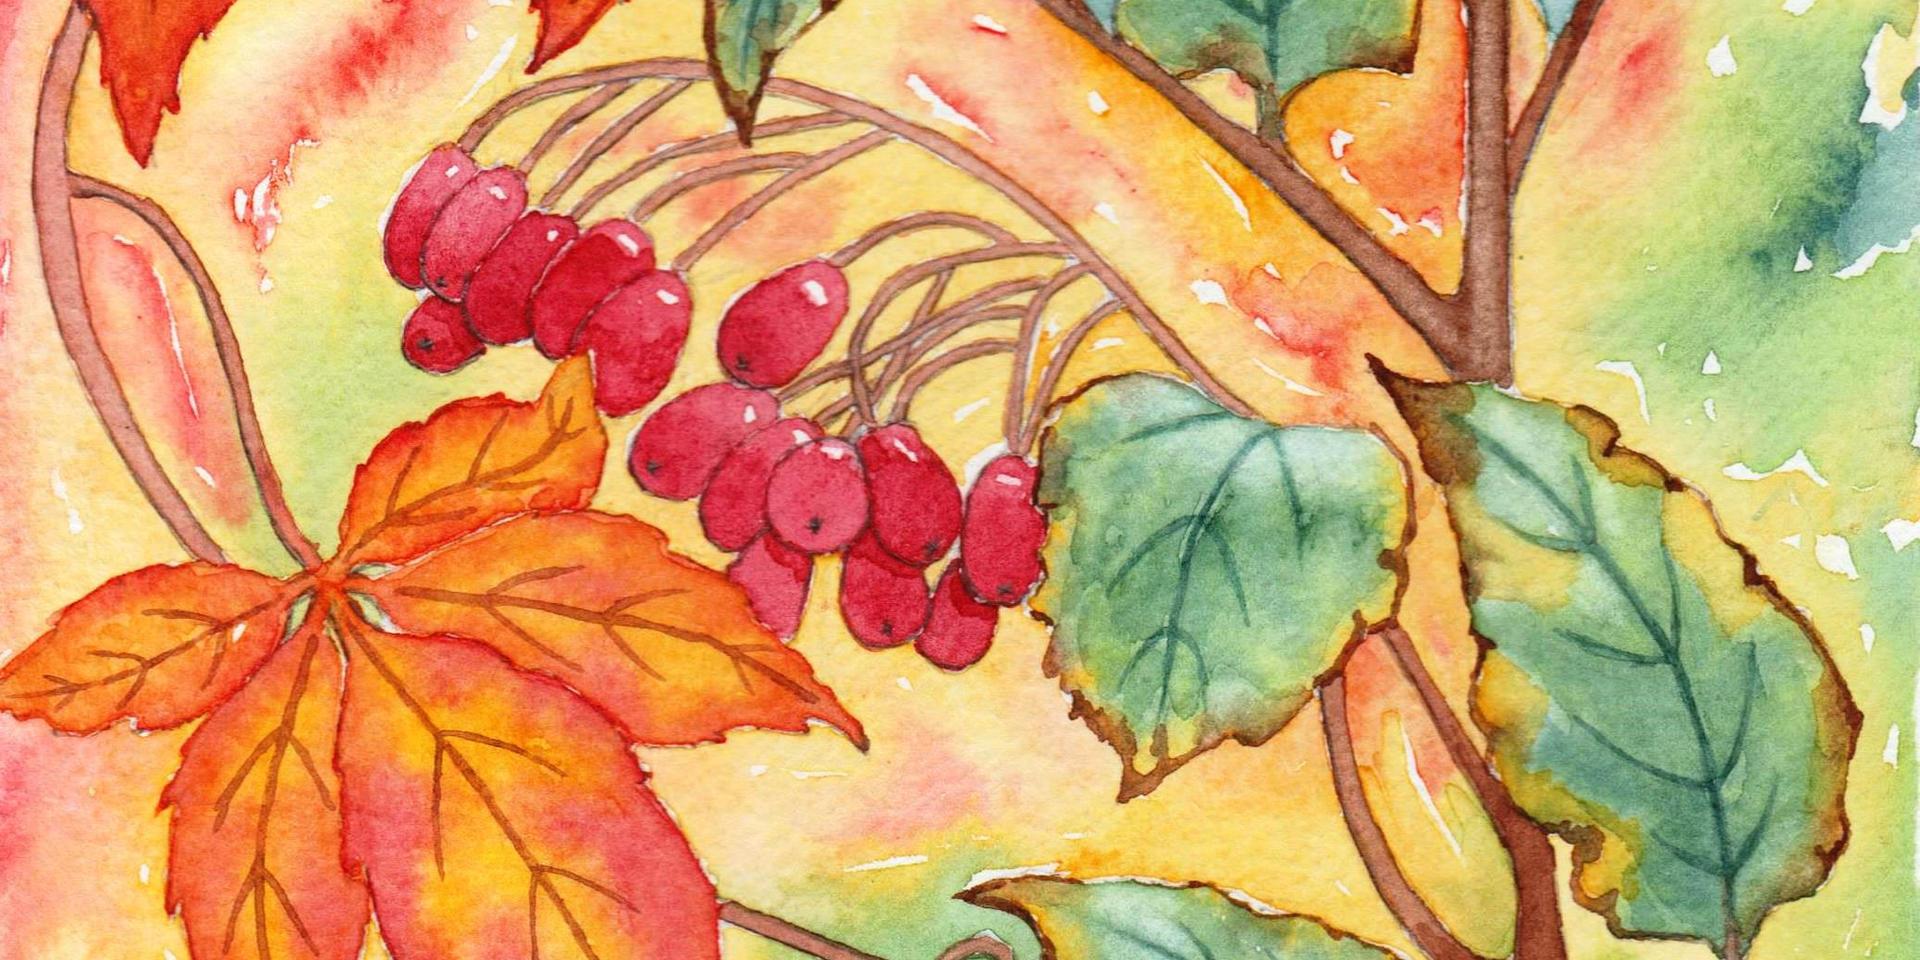 The Winner By Dennis Philpott Still on show with an autumn glow